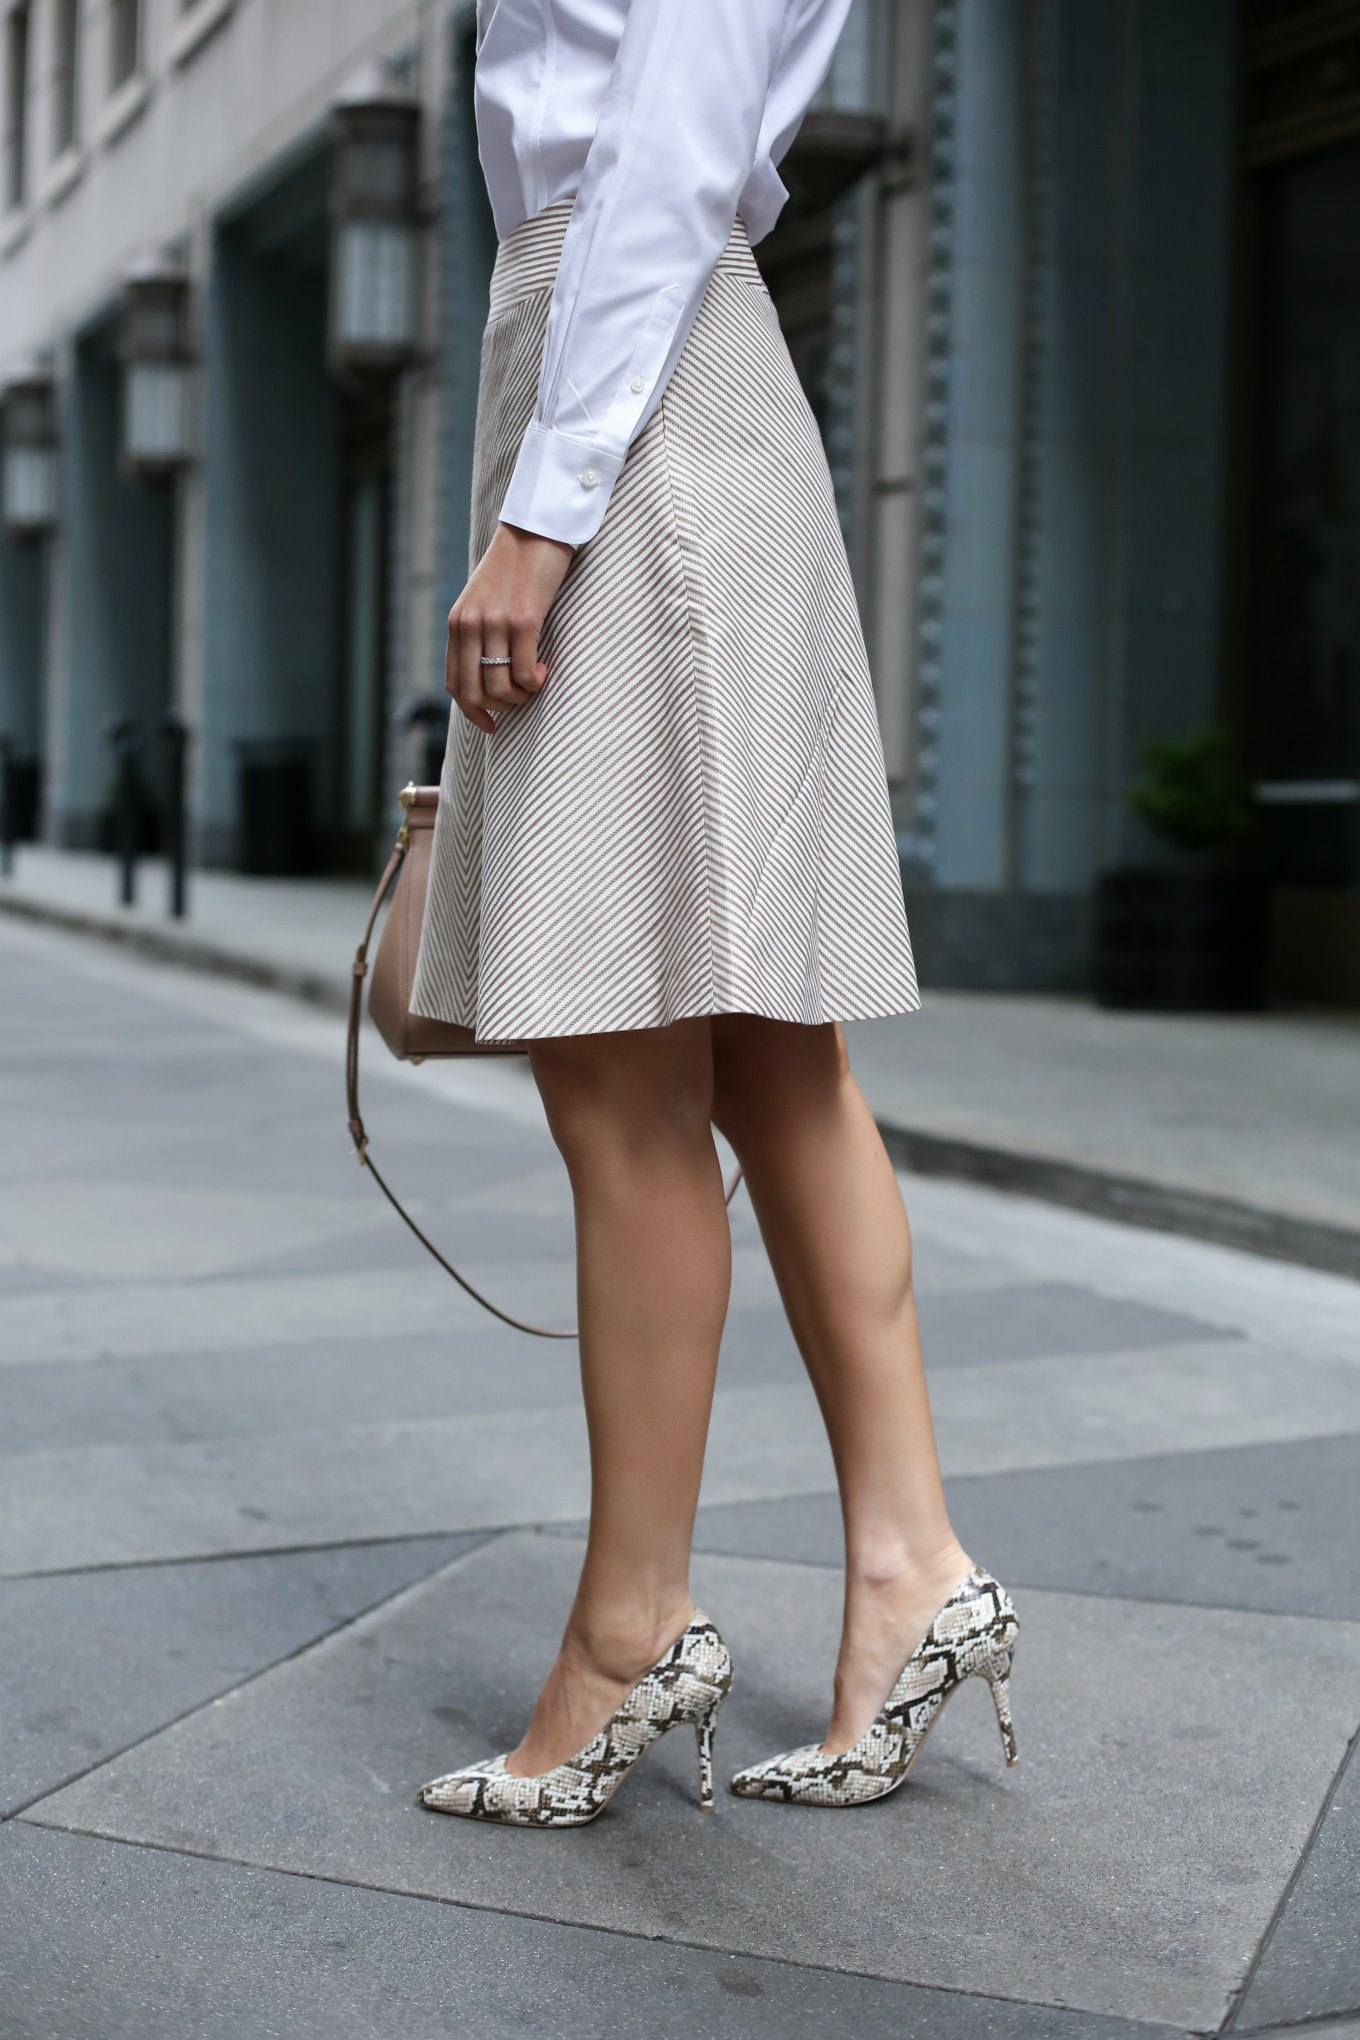 Tan Summer Sandals